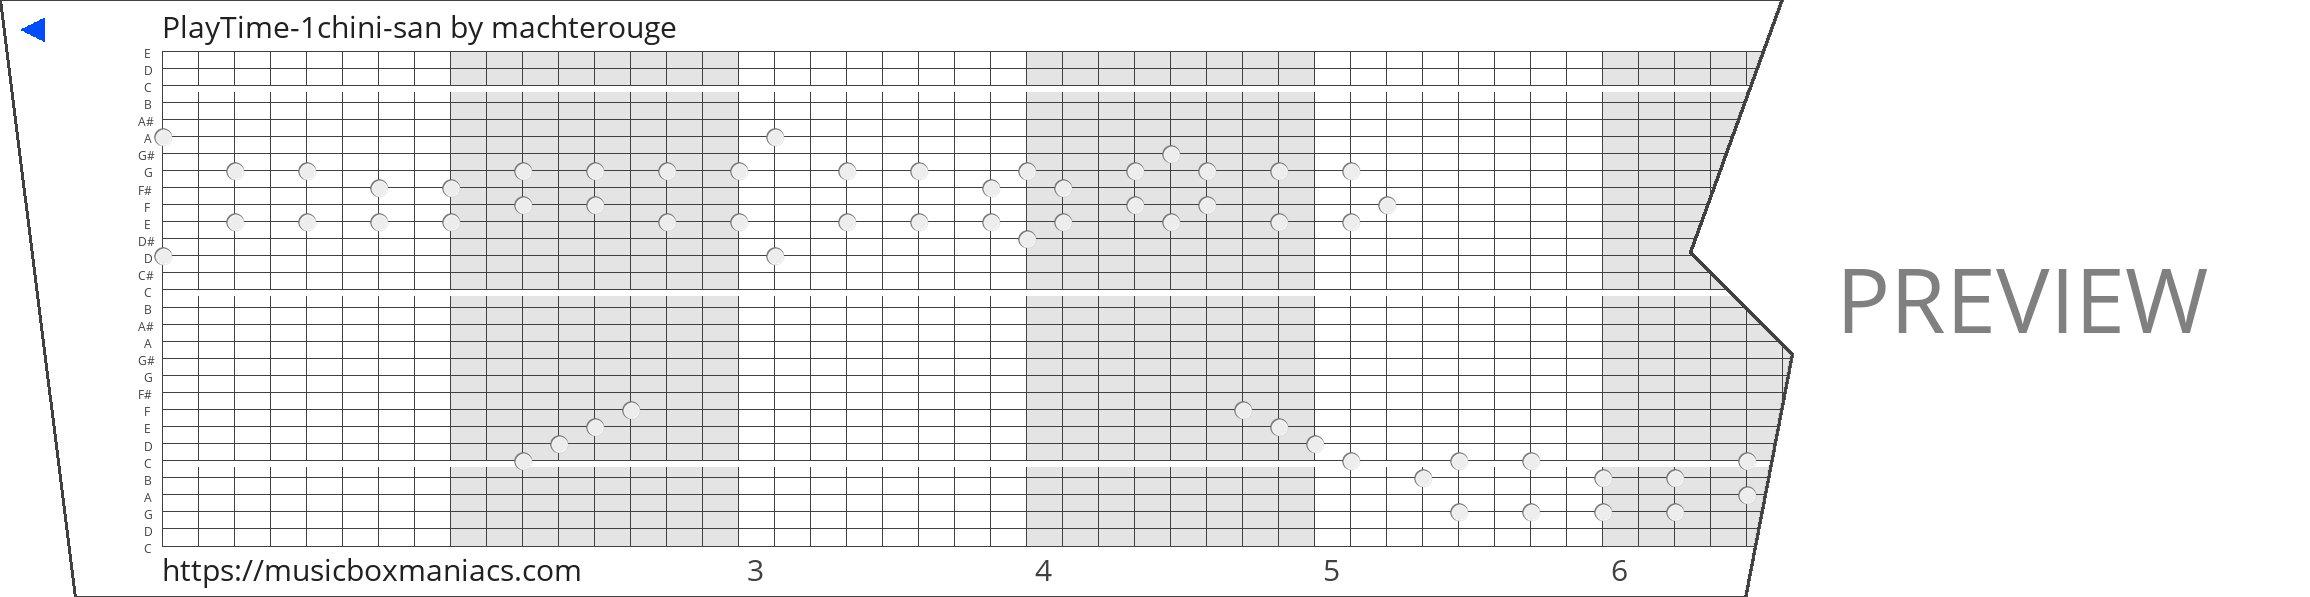 PlayTime-1chini-san 30 note music box paper strip